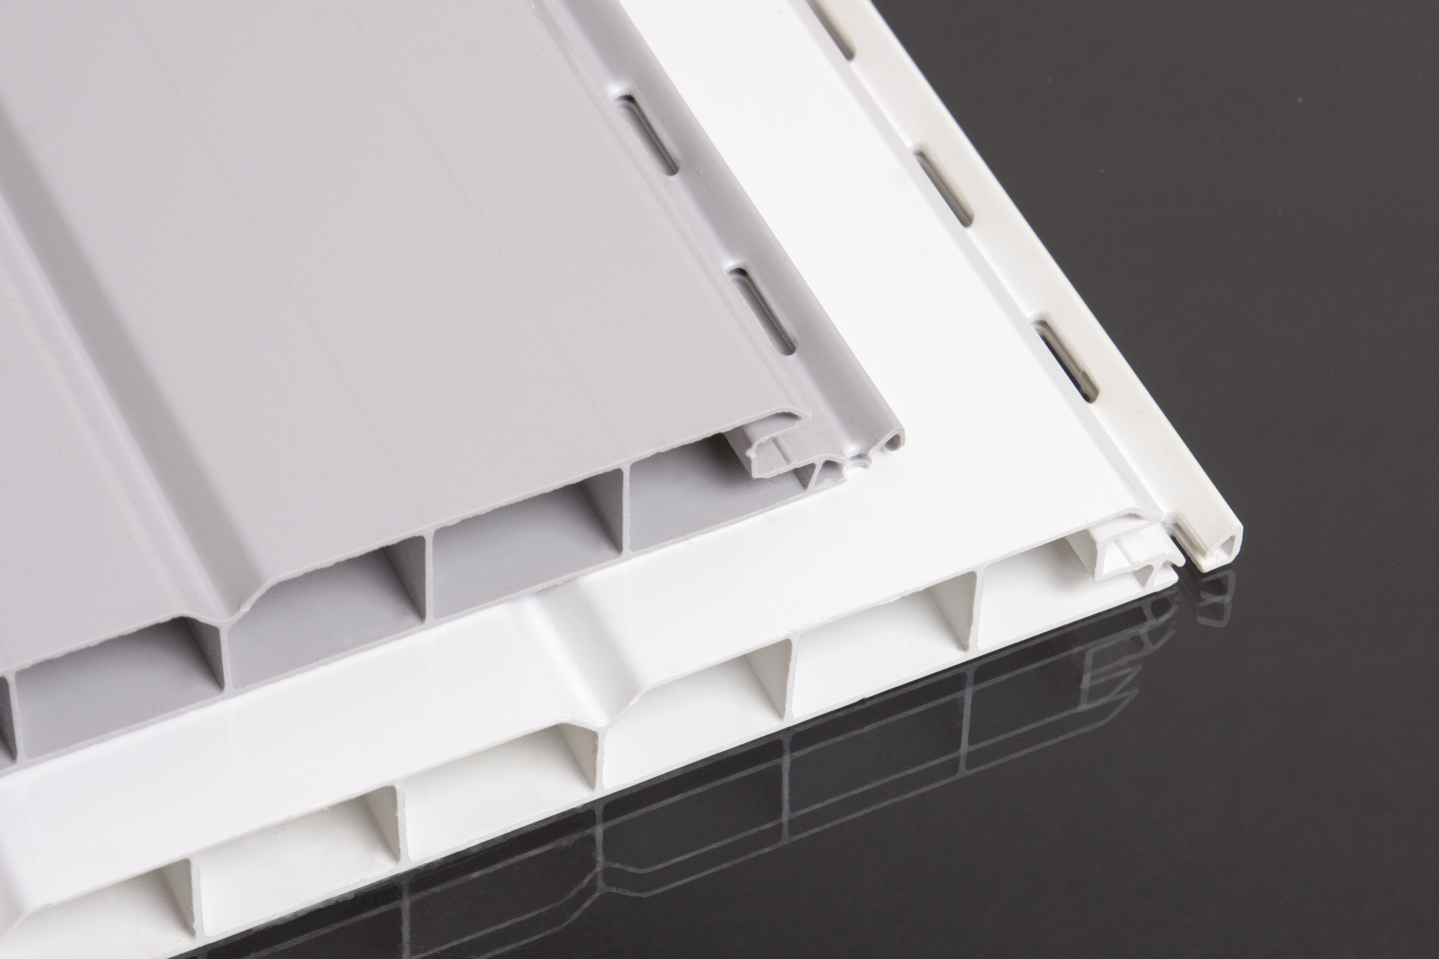 meine bedachung pvc paneele wei 16 mm nut und feder. Black Bedroom Furniture Sets. Home Design Ideas